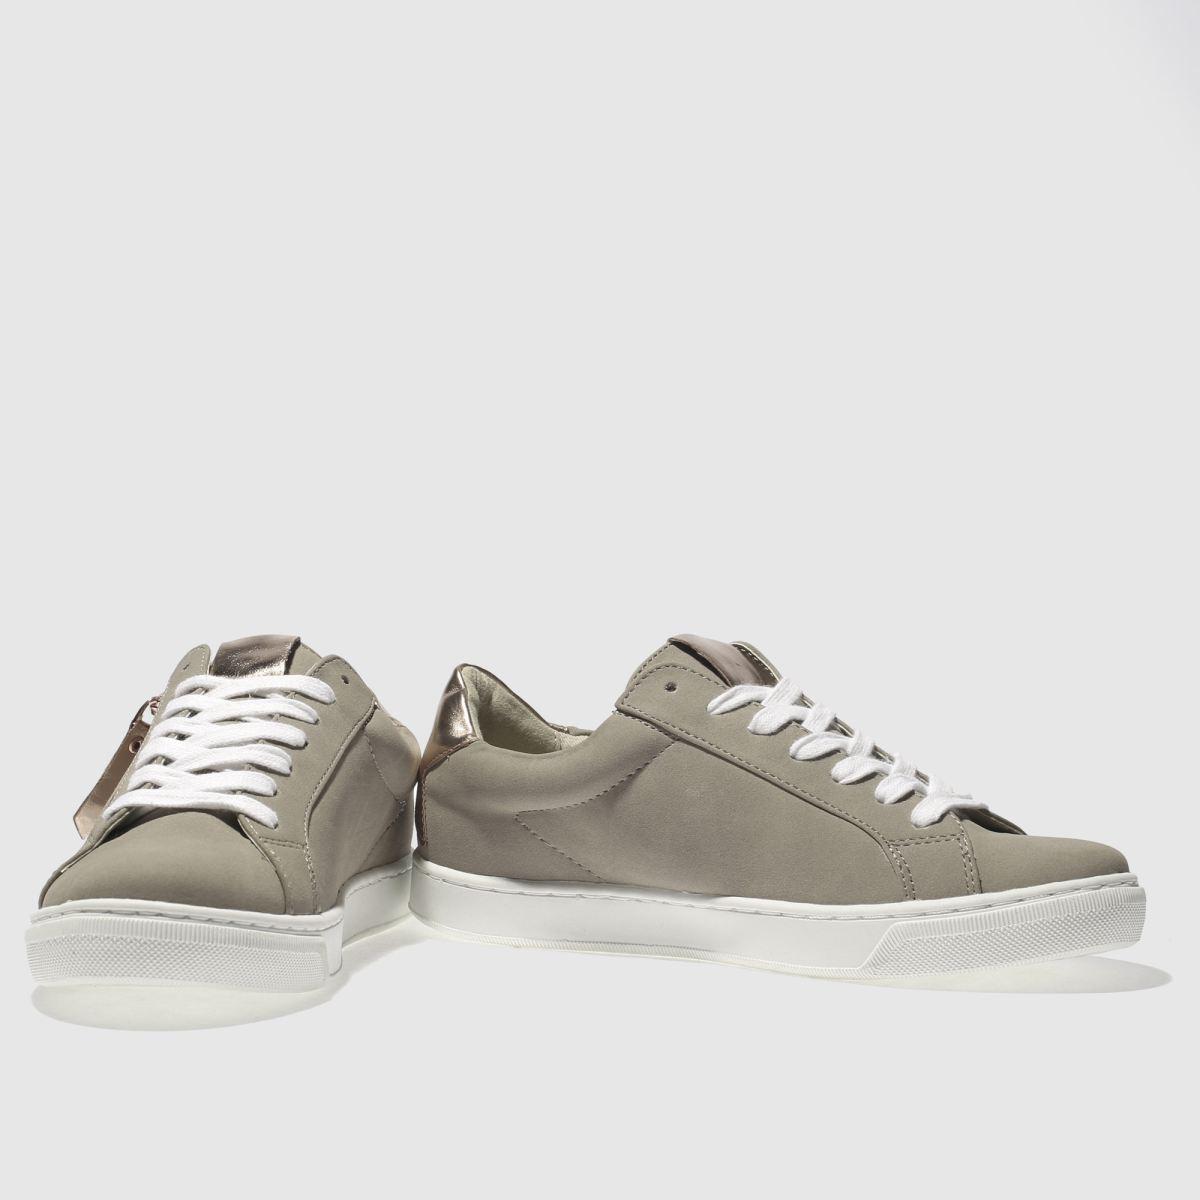 Damen Steingrau schuh Ninja Sneaker   schuh Gute Qualität beliebte Schuhe